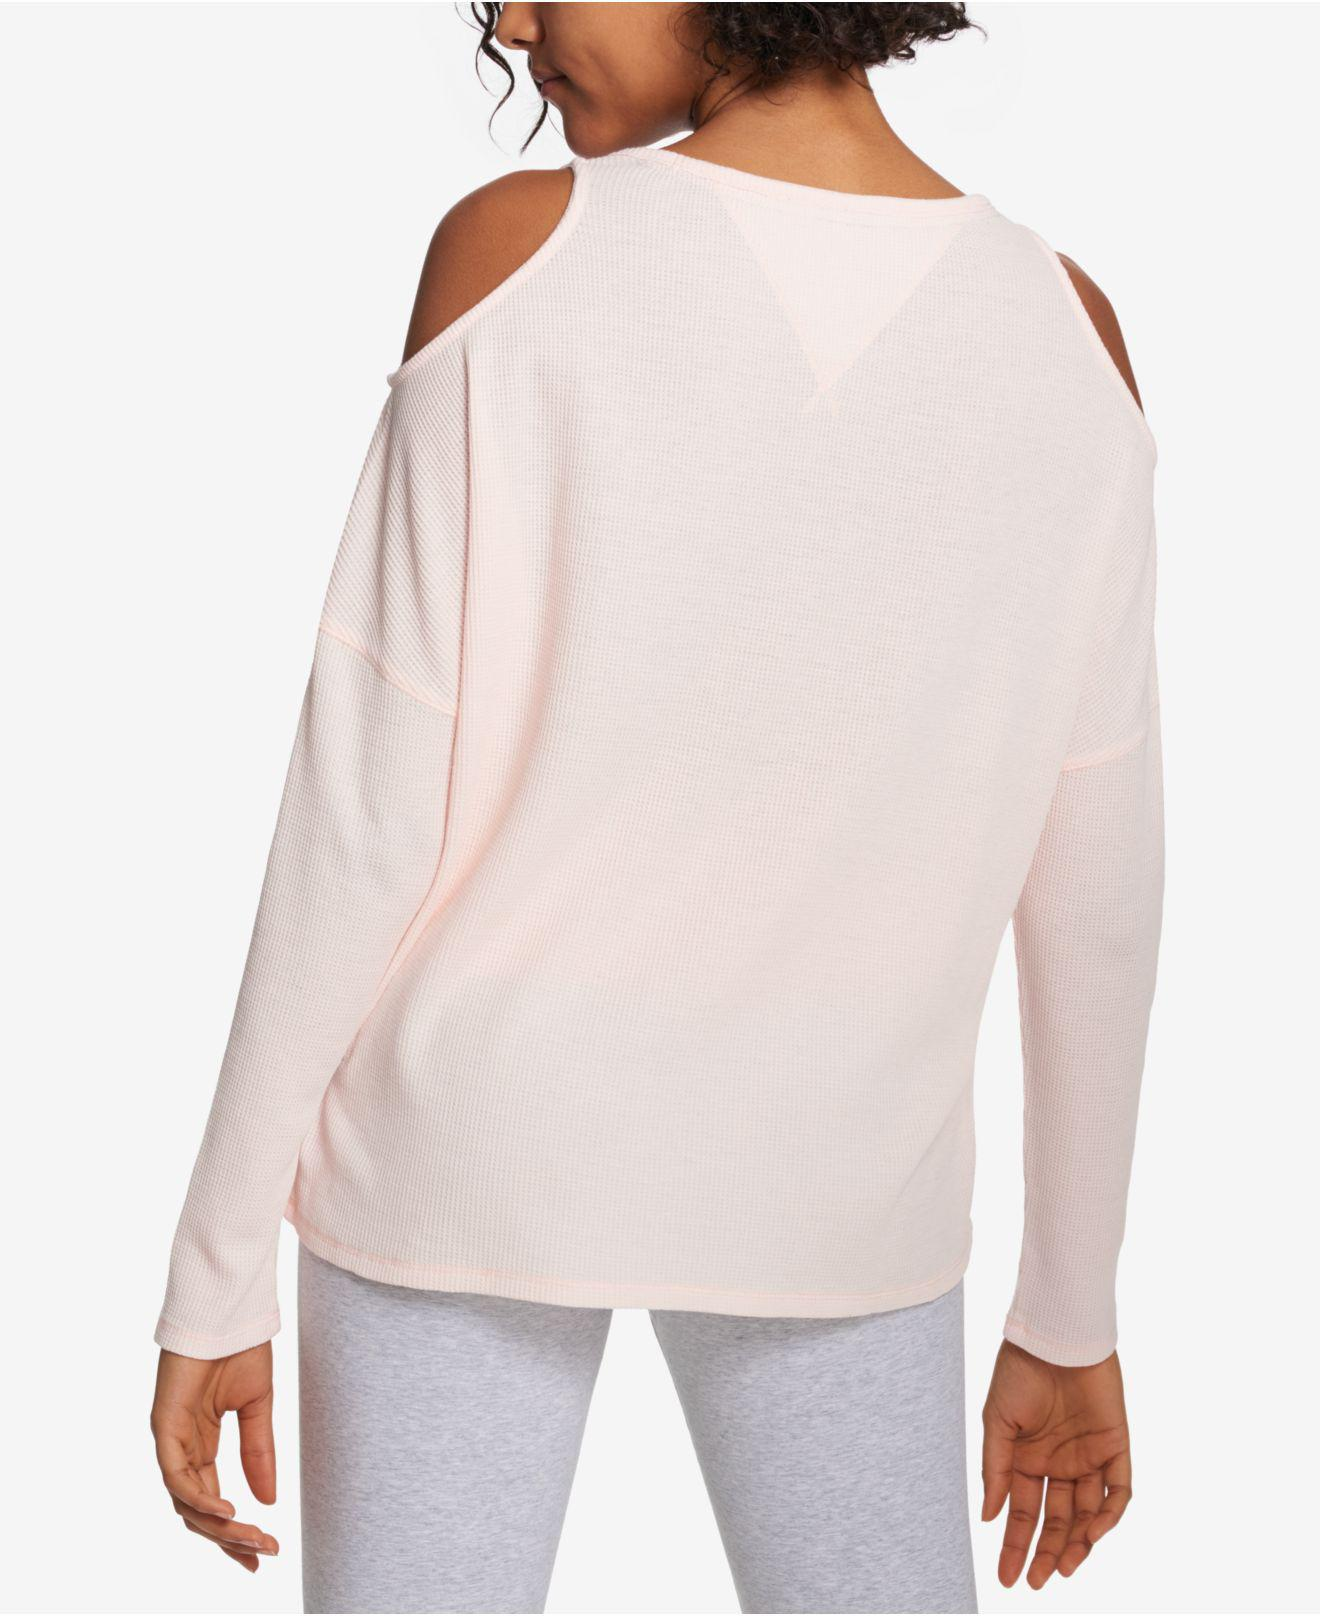 4581a96d150bf Lyst - Tommy Hilfiger Sport Cold-shoulder Waffle-knit Top